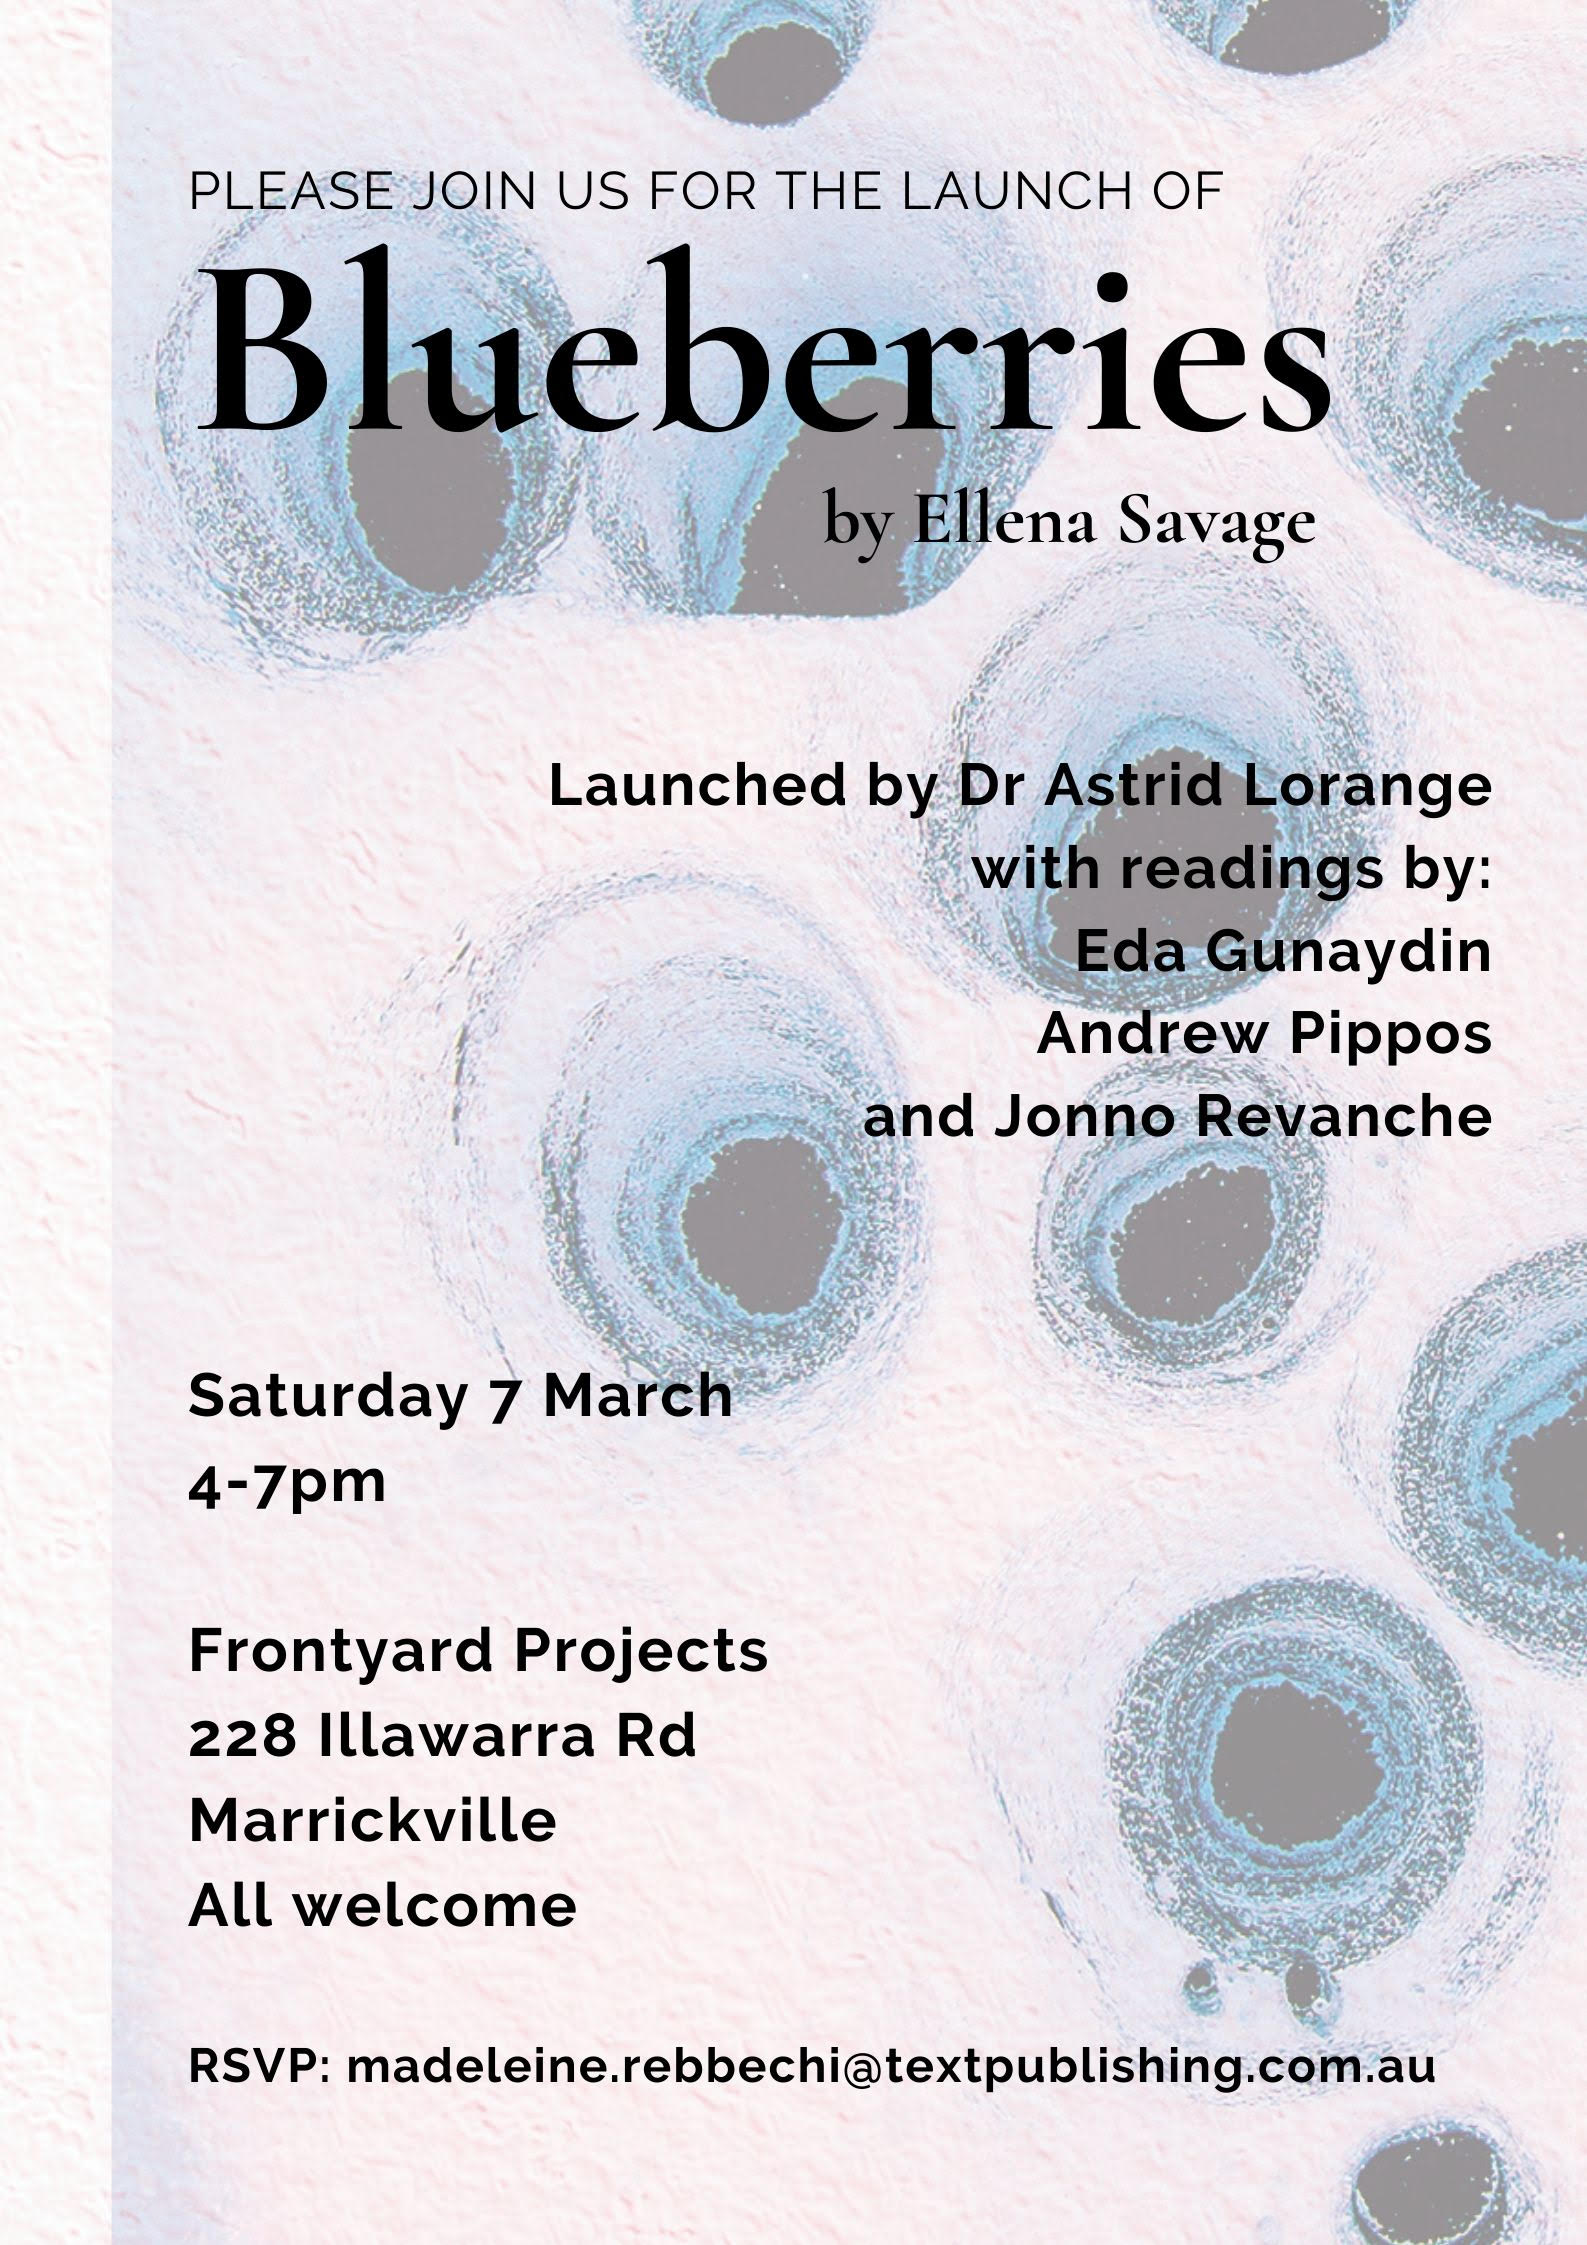 Bluebs_Sydneylaunch invite